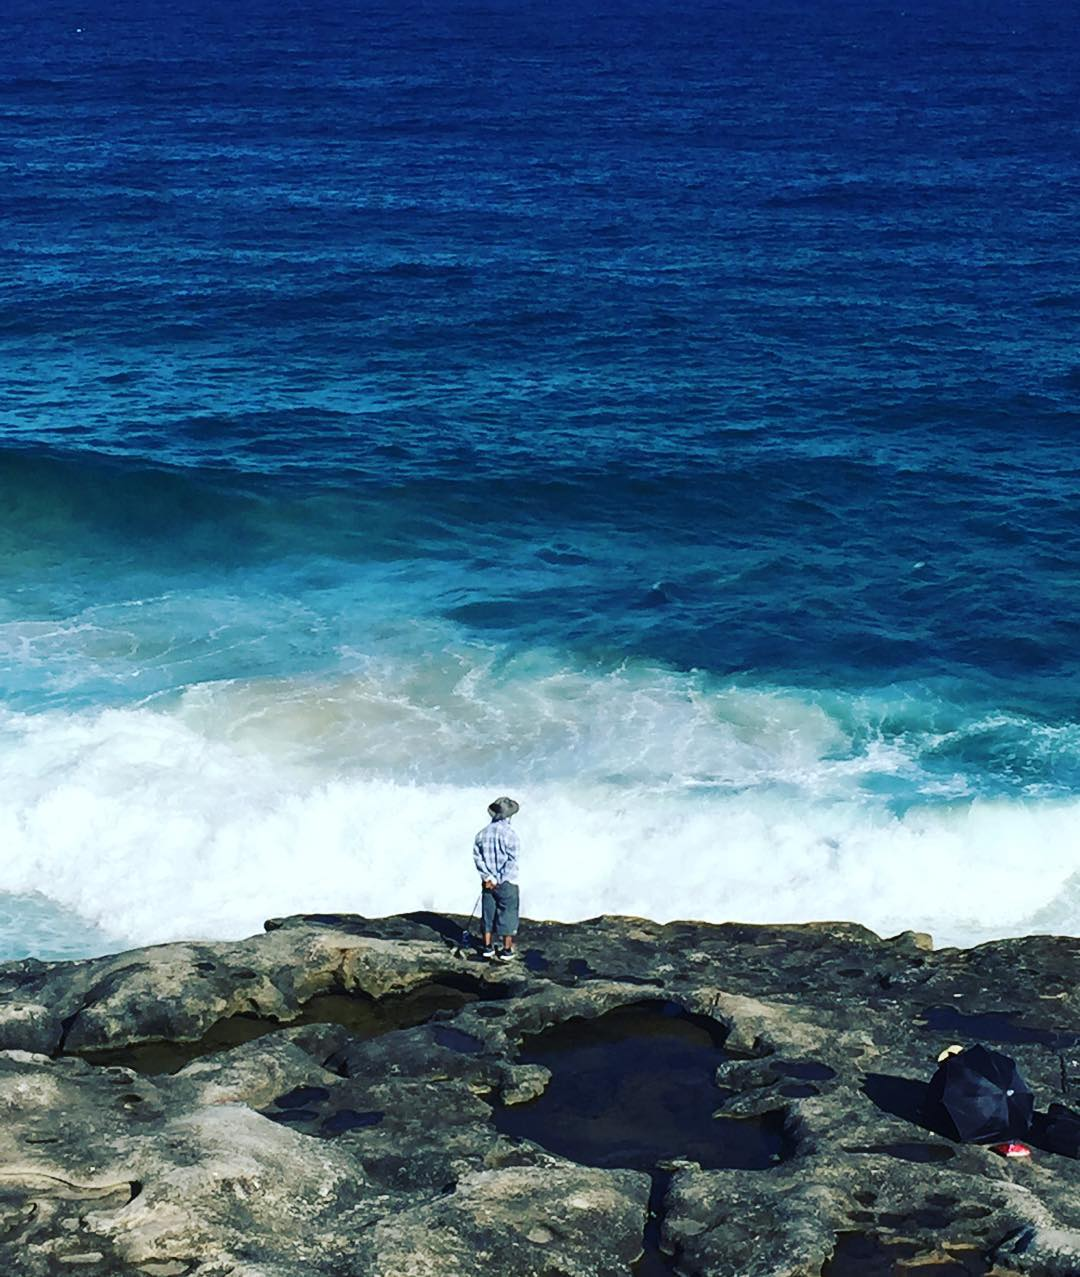 Oceanity! #trippingmood #australia #fishing